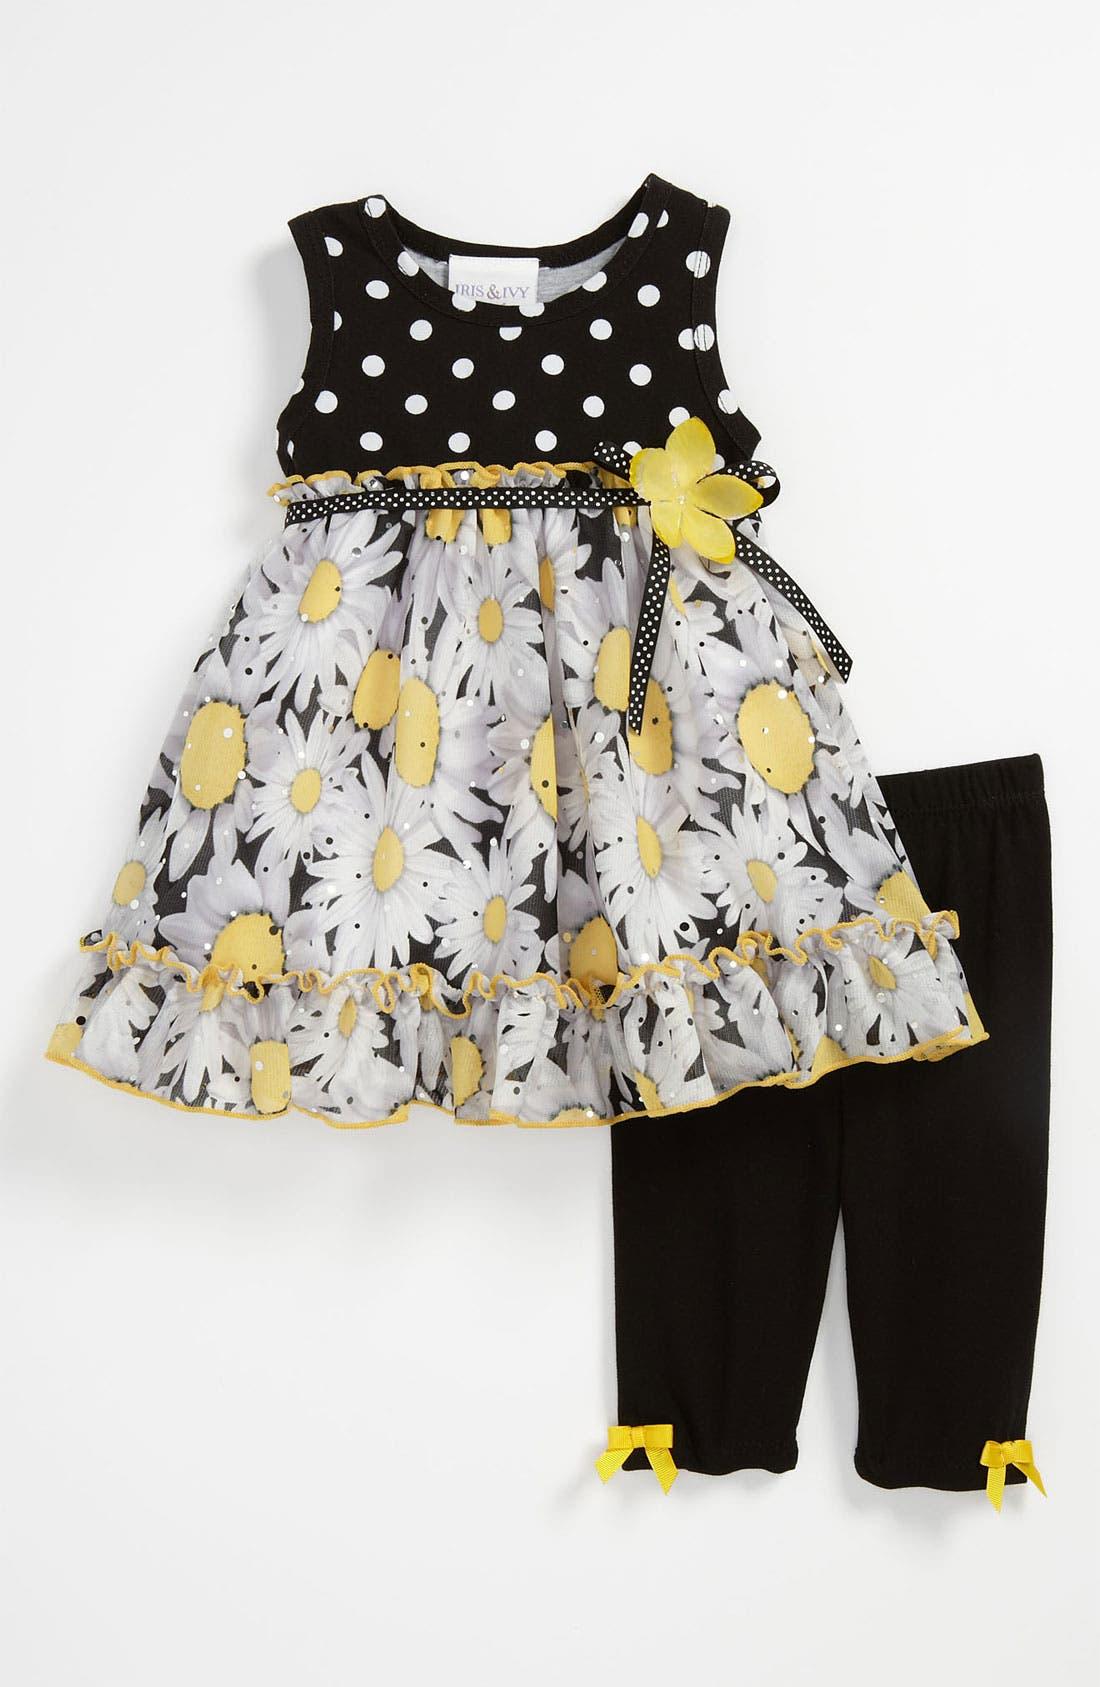 Alternate Image 1 Selected - Iris & Ivy 'Daisy' Dress & Leggings (Baby)